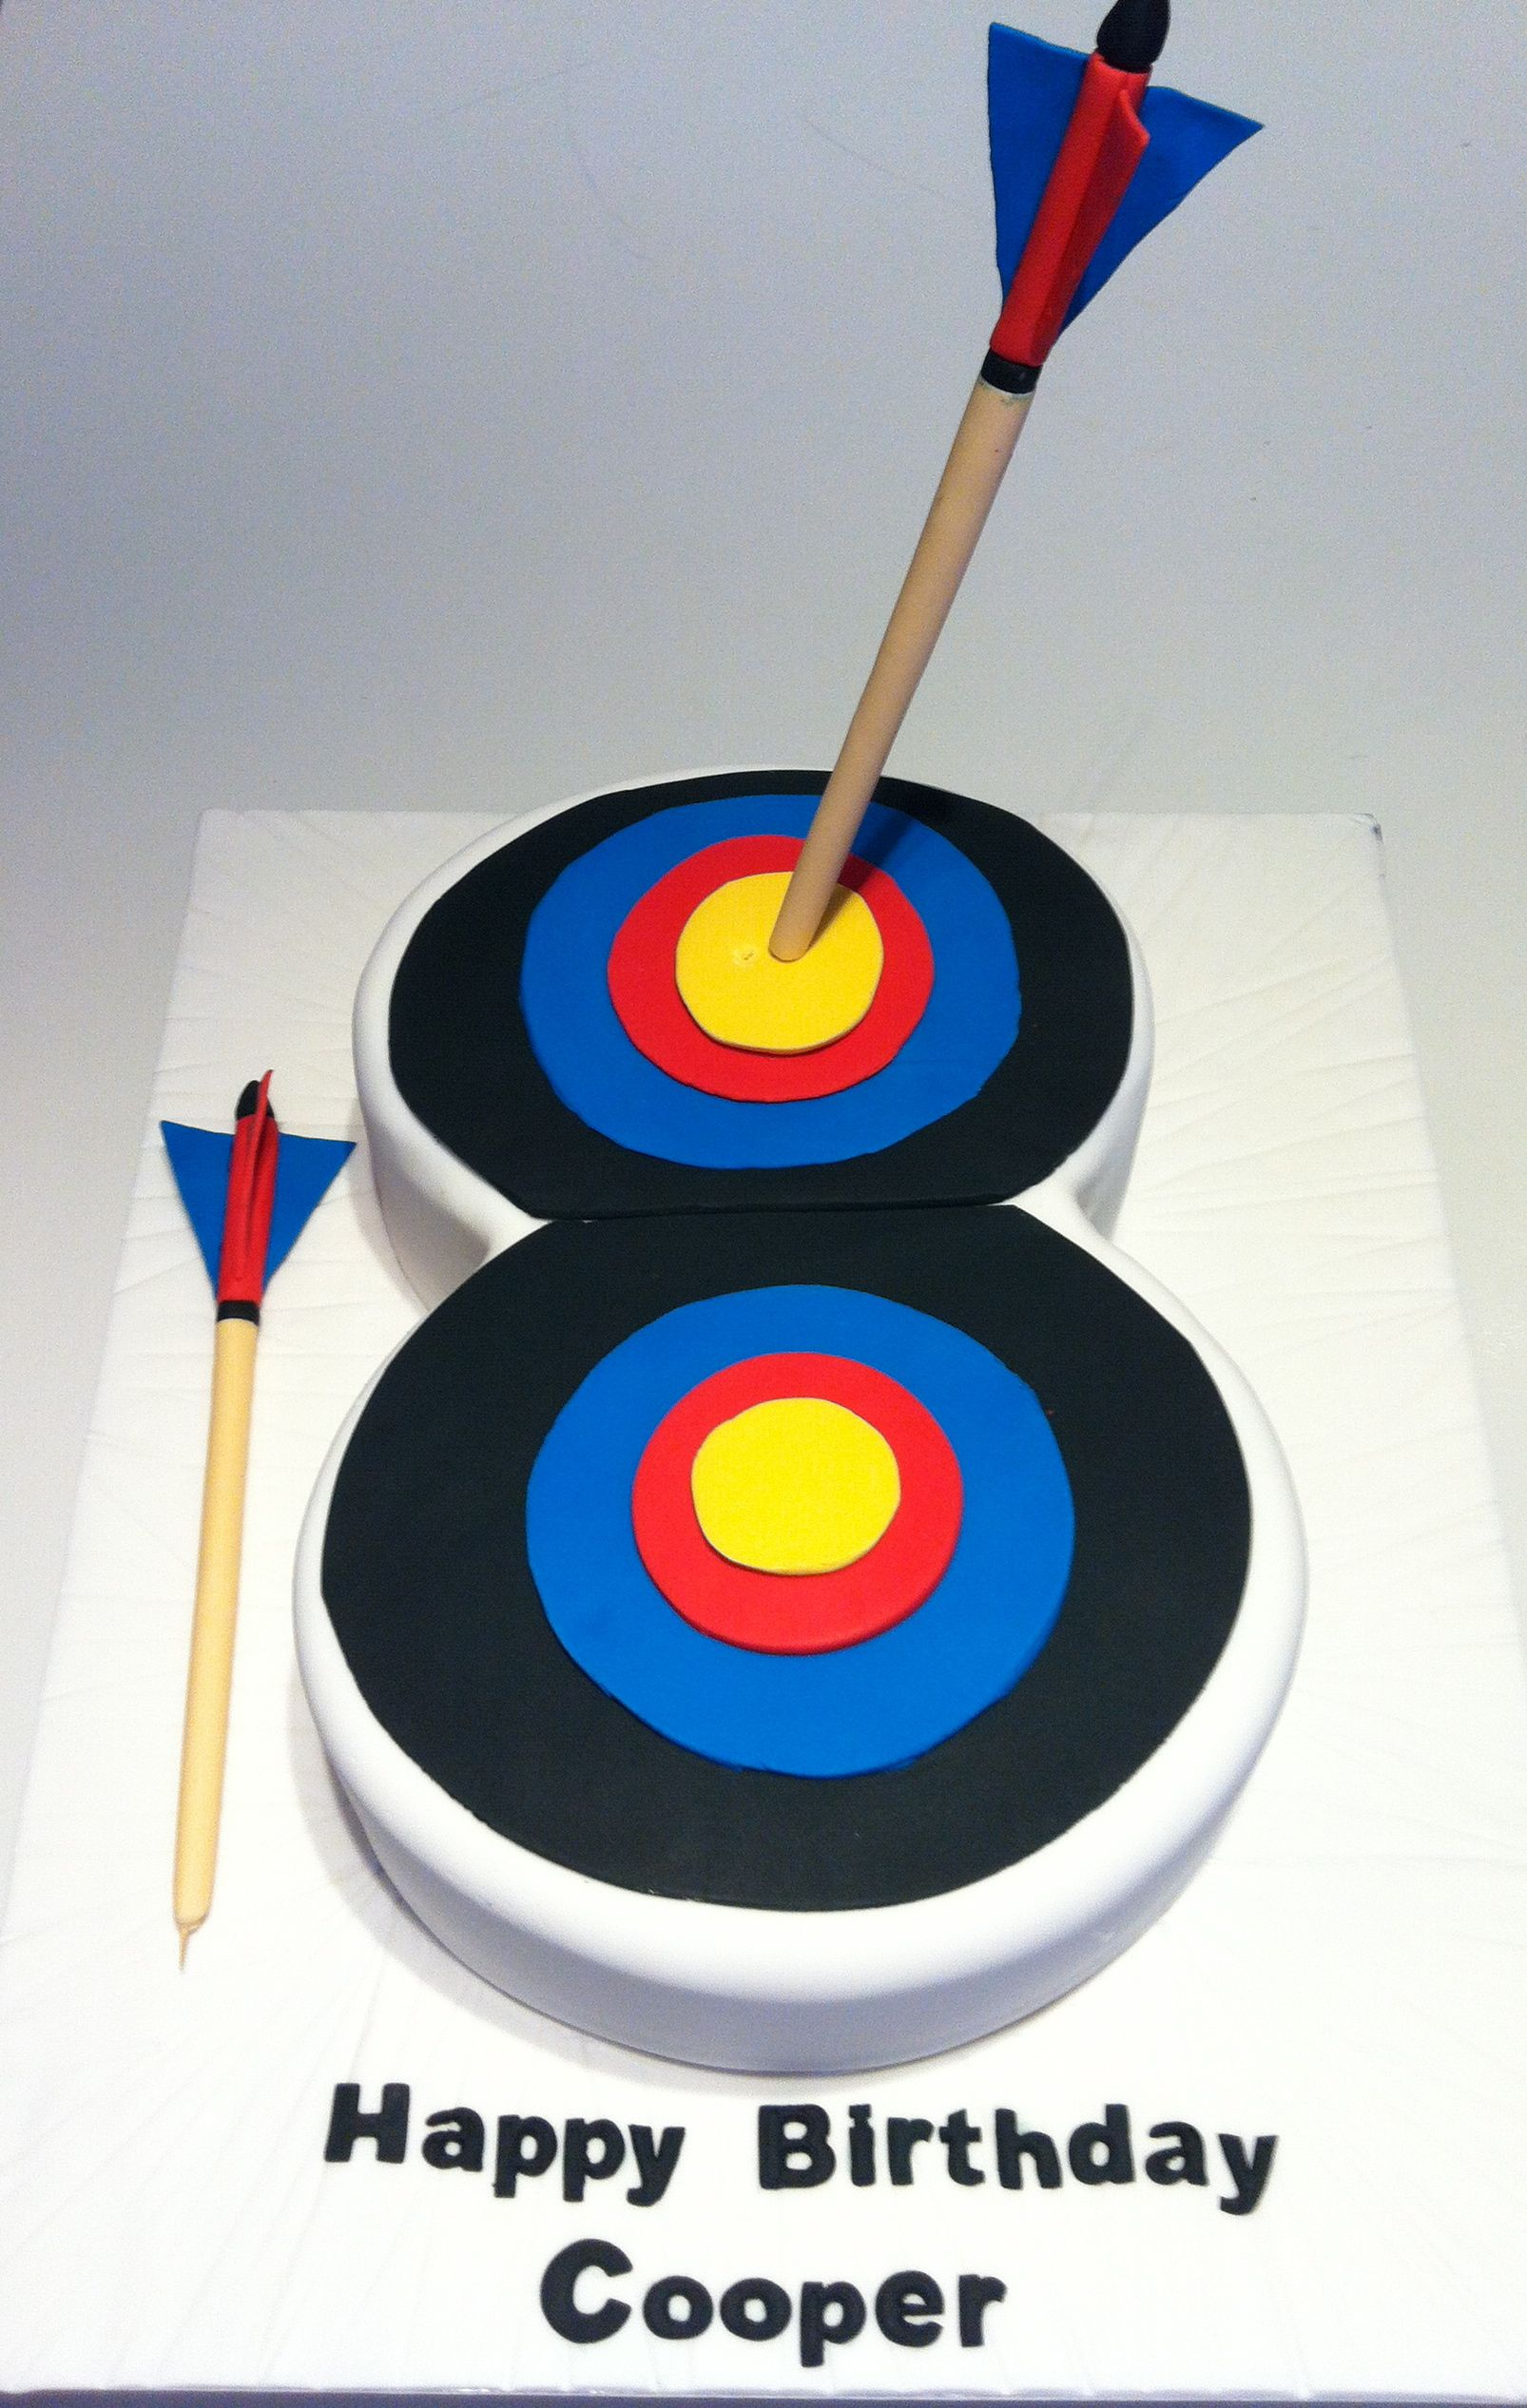 Archery Target Cake Happy Birthday Cooper shahems birthday